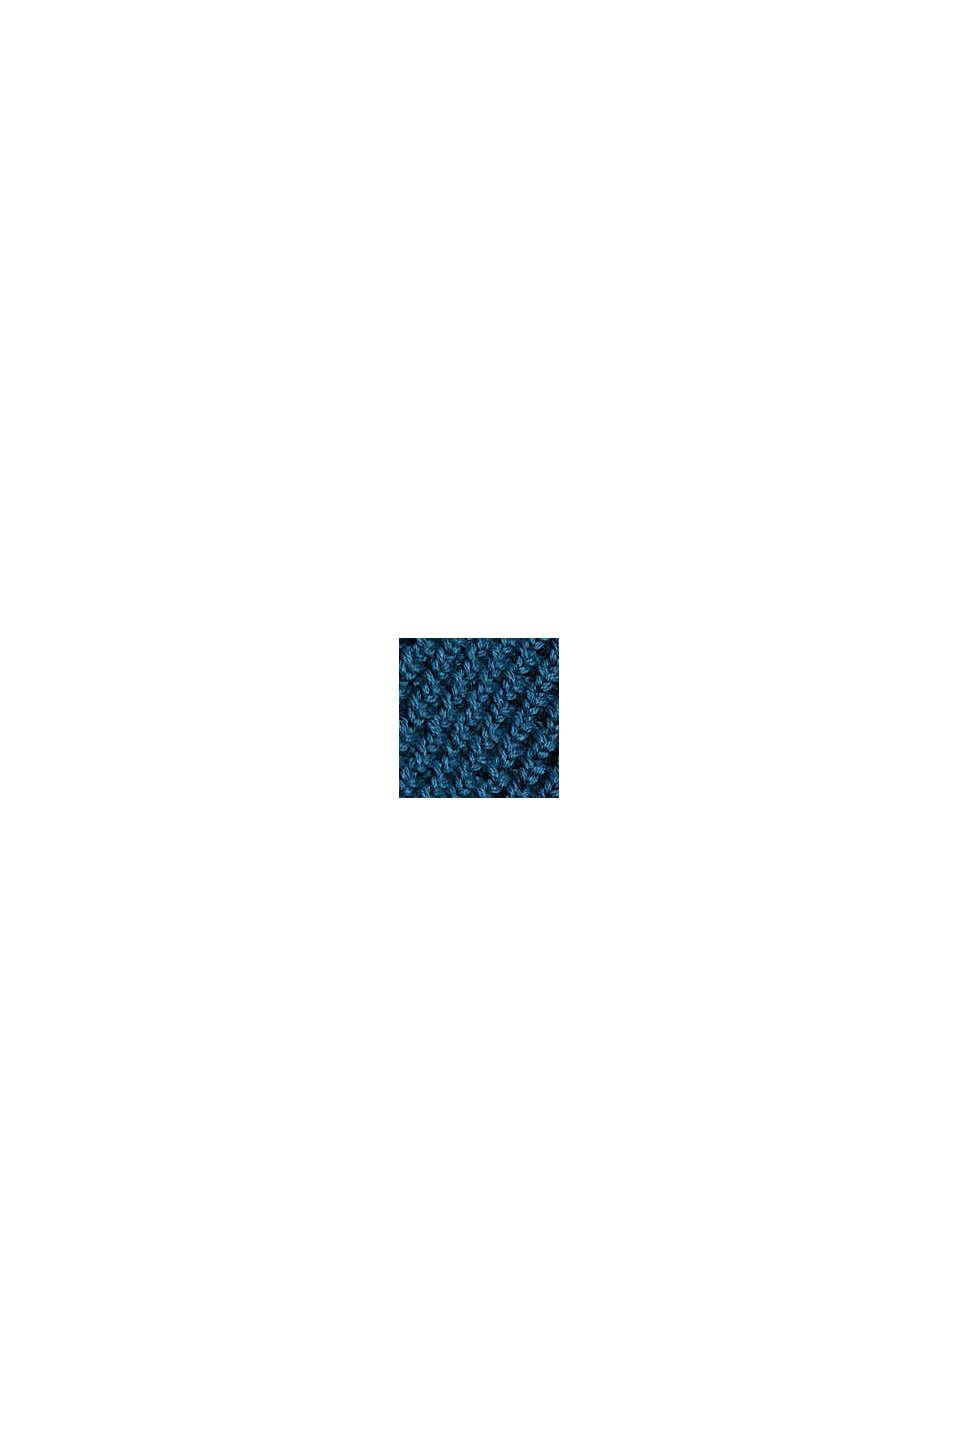 Pull-over en maille de coton Pima, PETROL BLUE, swatch